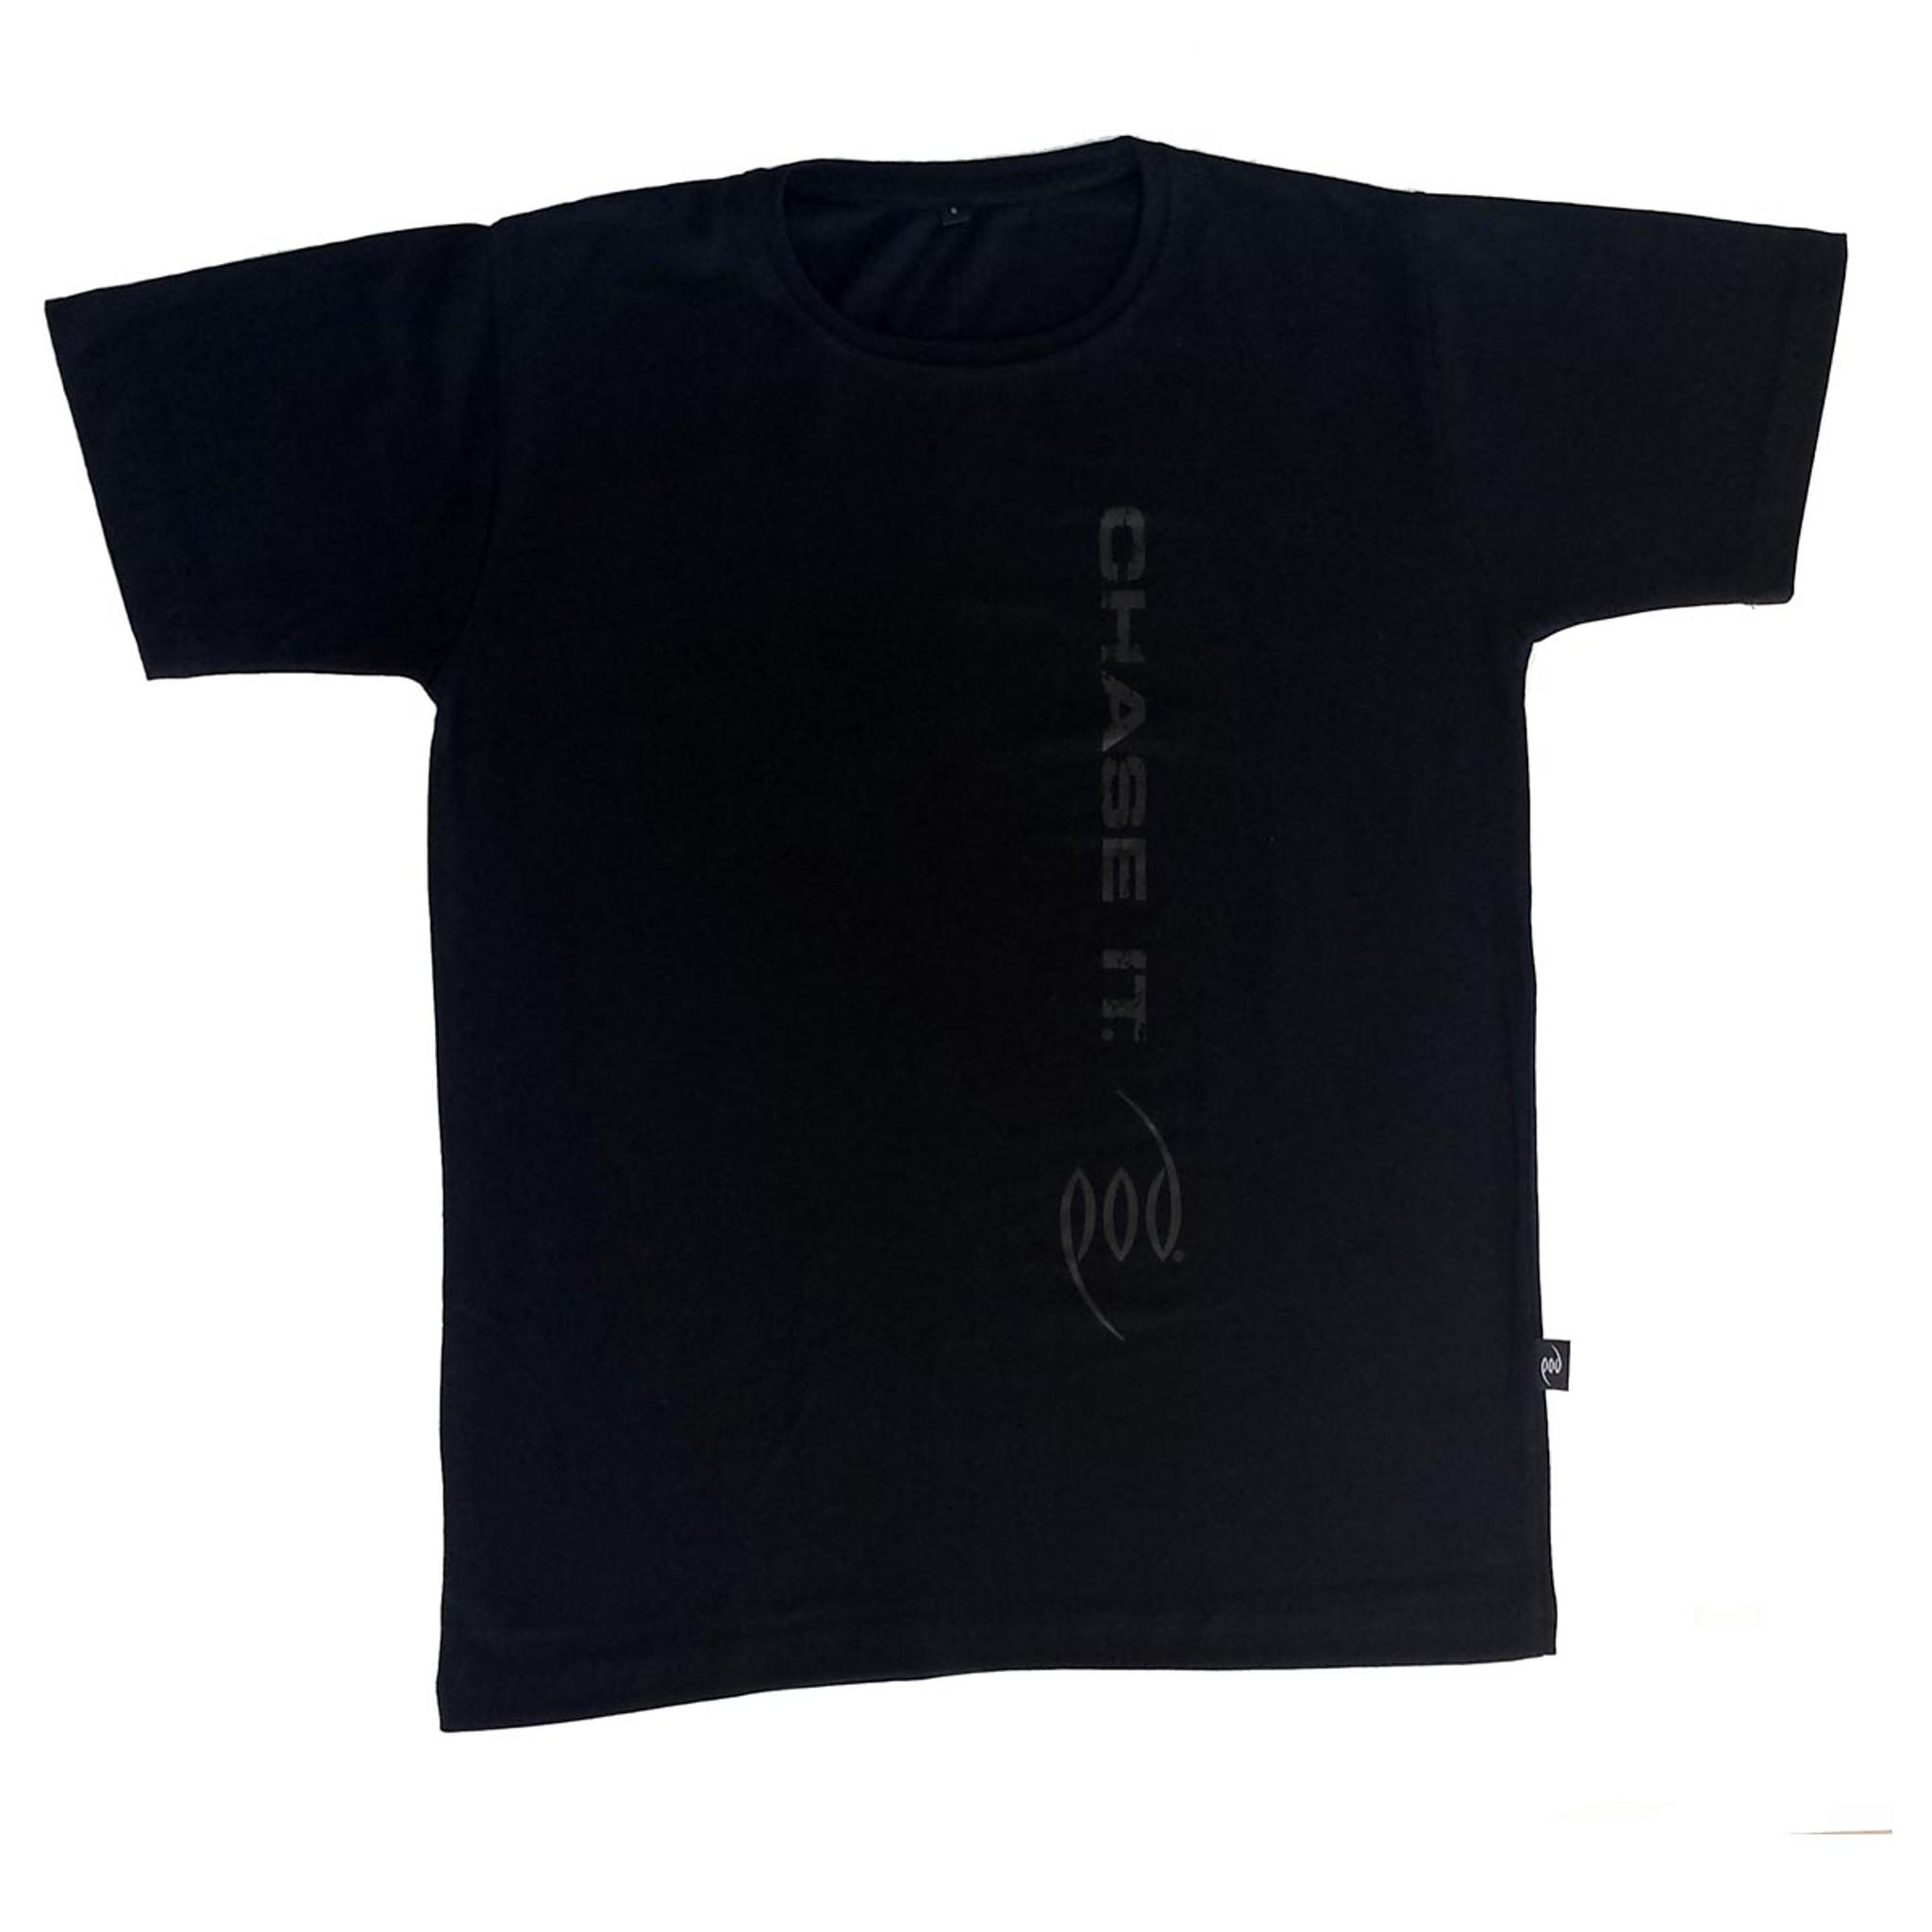 Black with black print